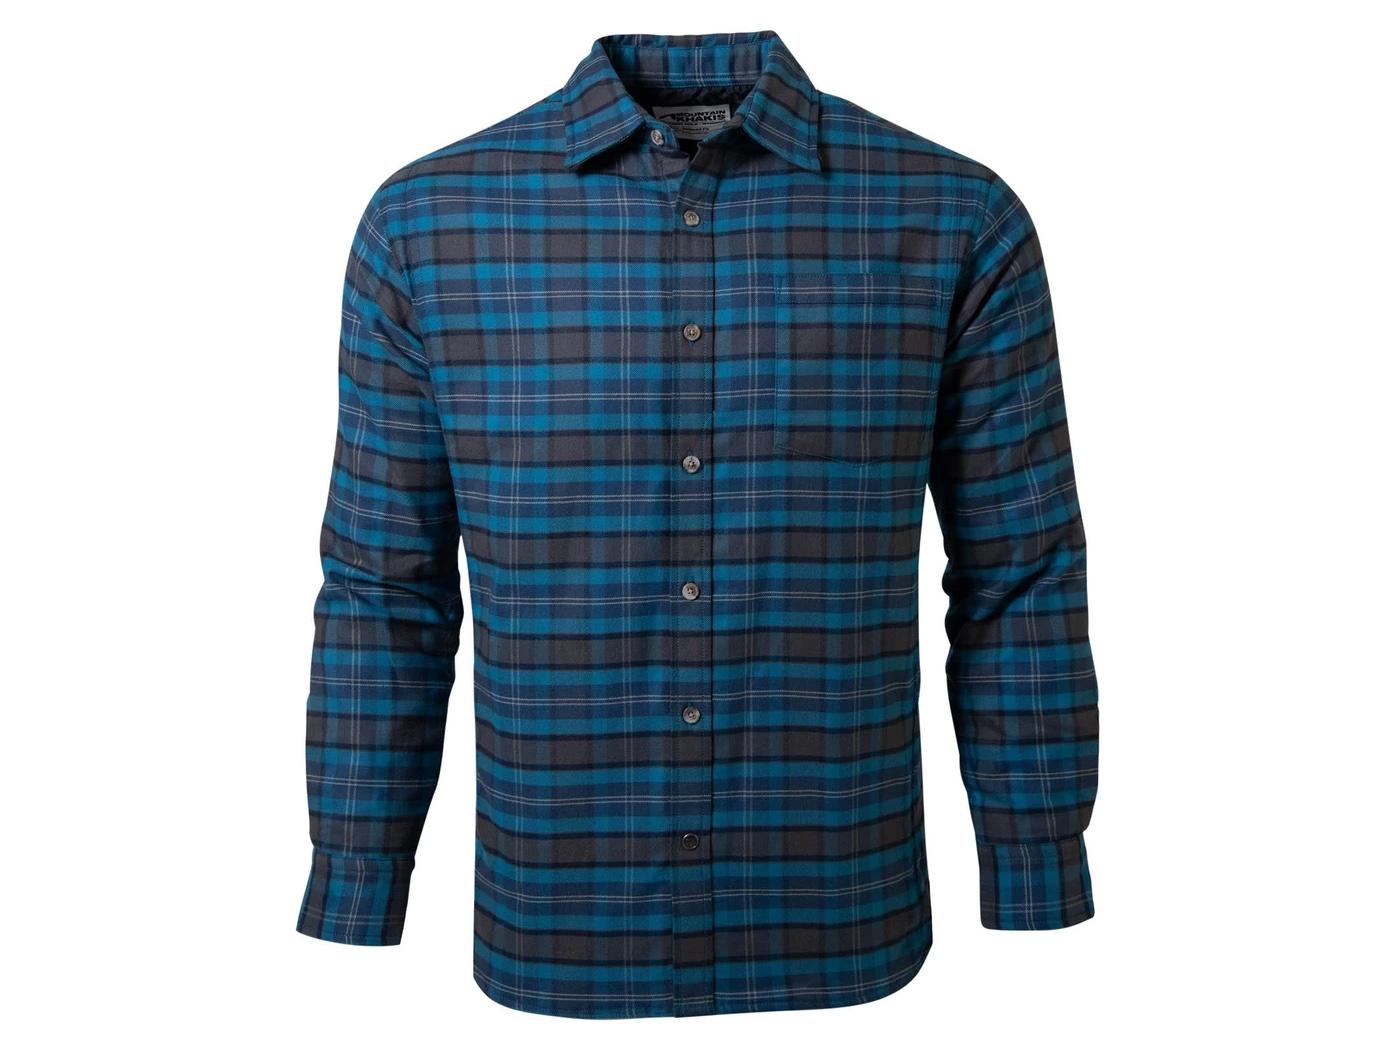 Mountain Khakis Moran Insulated Shirt Jacket